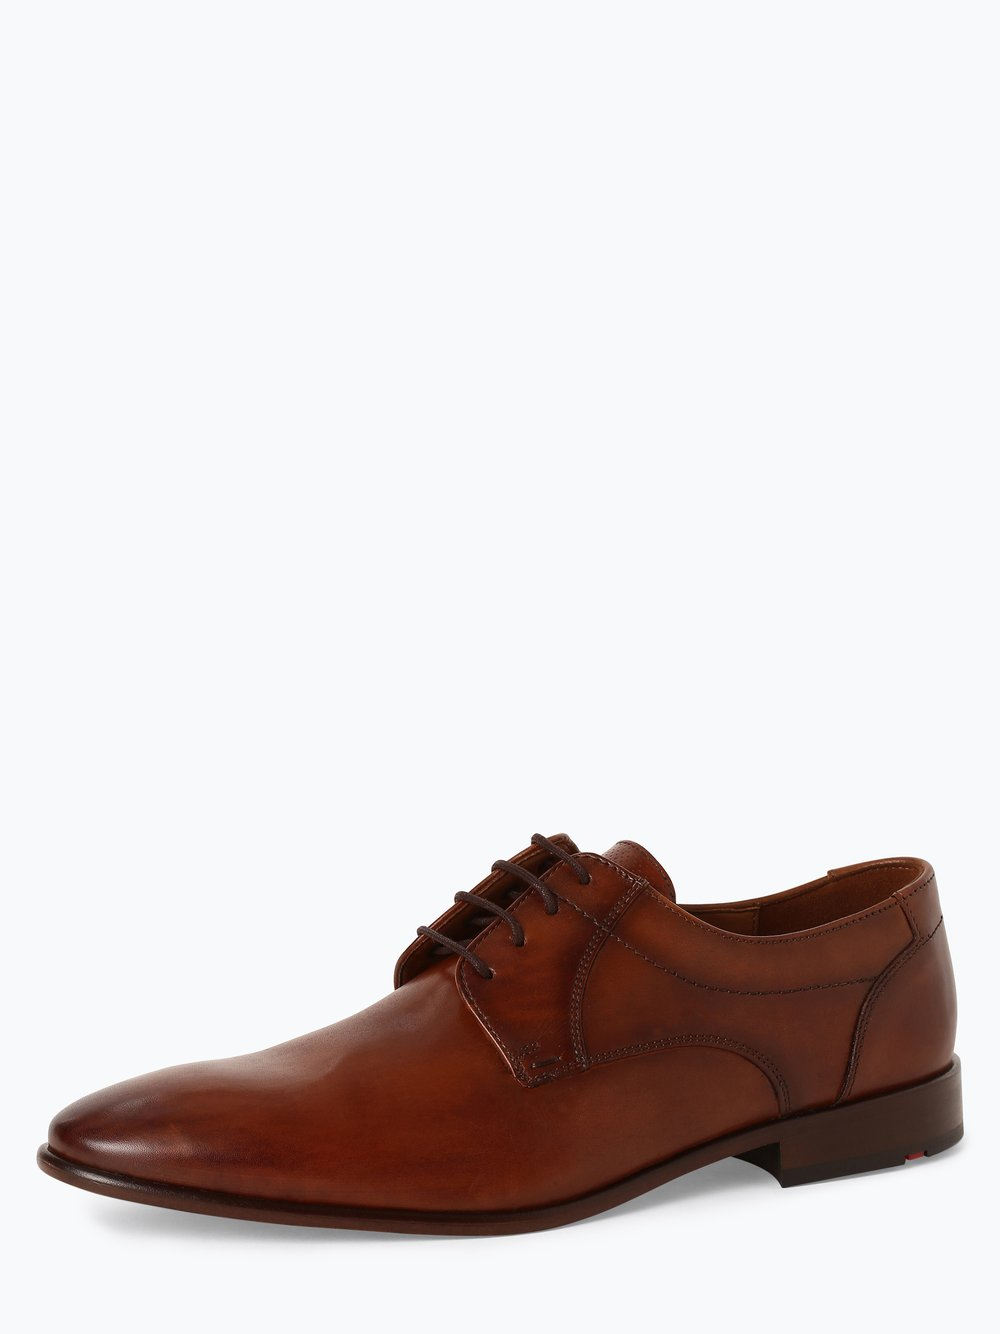 Lloyd – Męskie buty sznurowane ze skóry – Manon, beżowy Van Graaf 449121-0001-00075